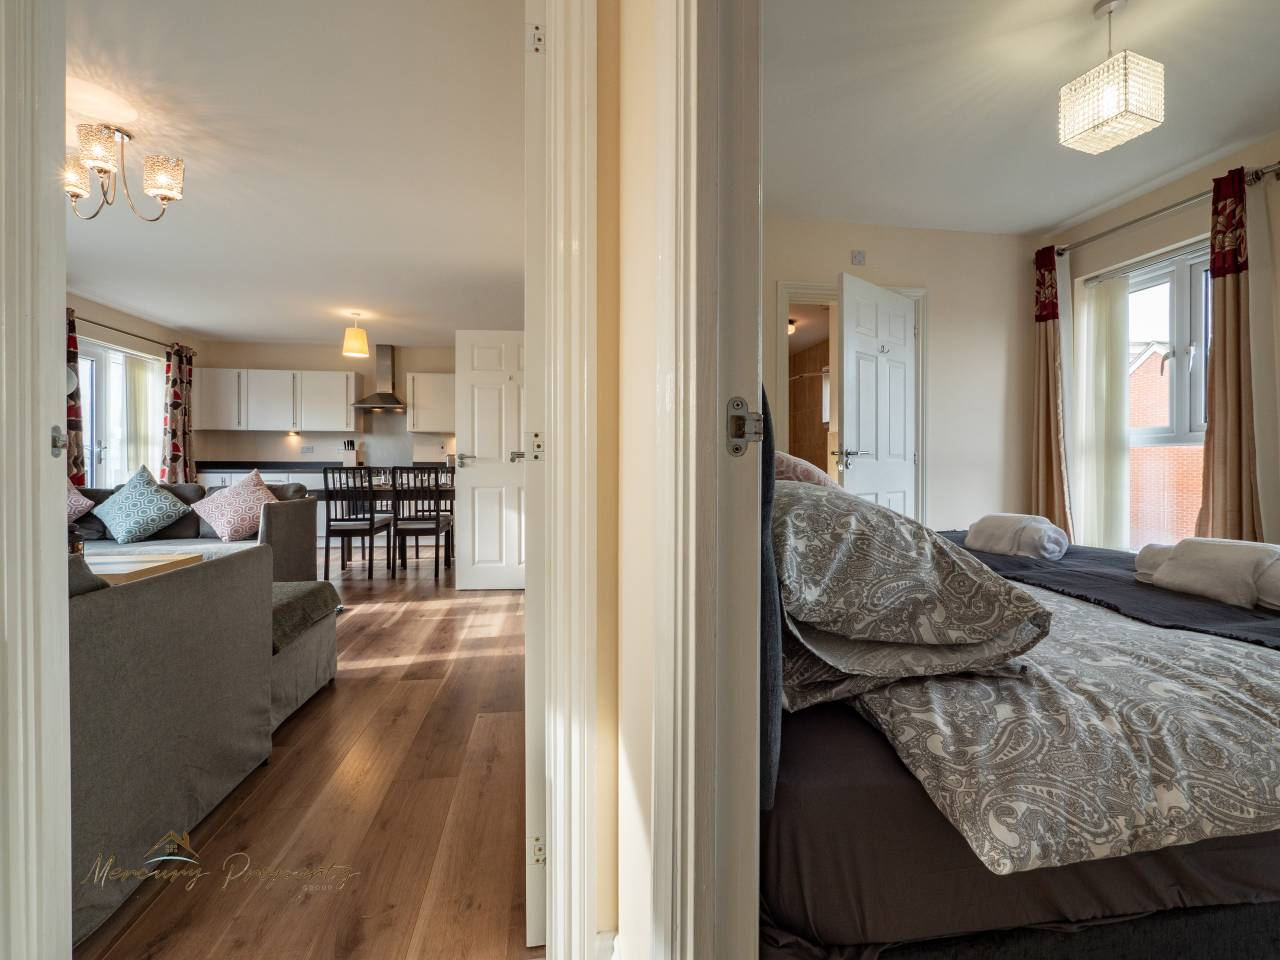 Apartment Ashdown -Bed Apartment Reading Town w  Balcony  5  photo 18465560